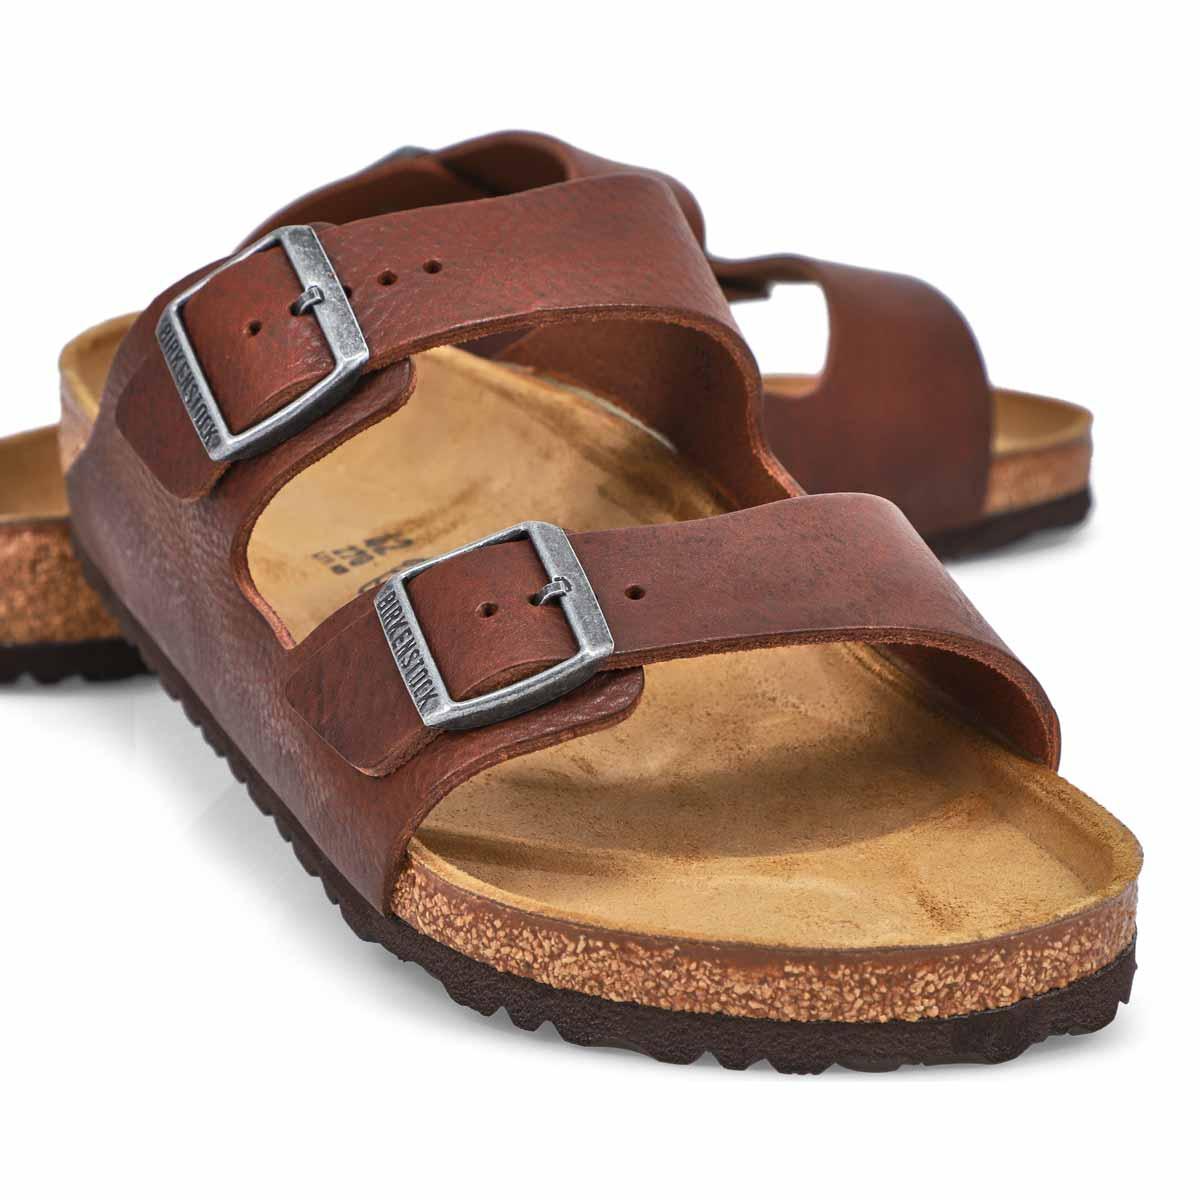 Men's Arizona LTR Sandal - Vintage Roast